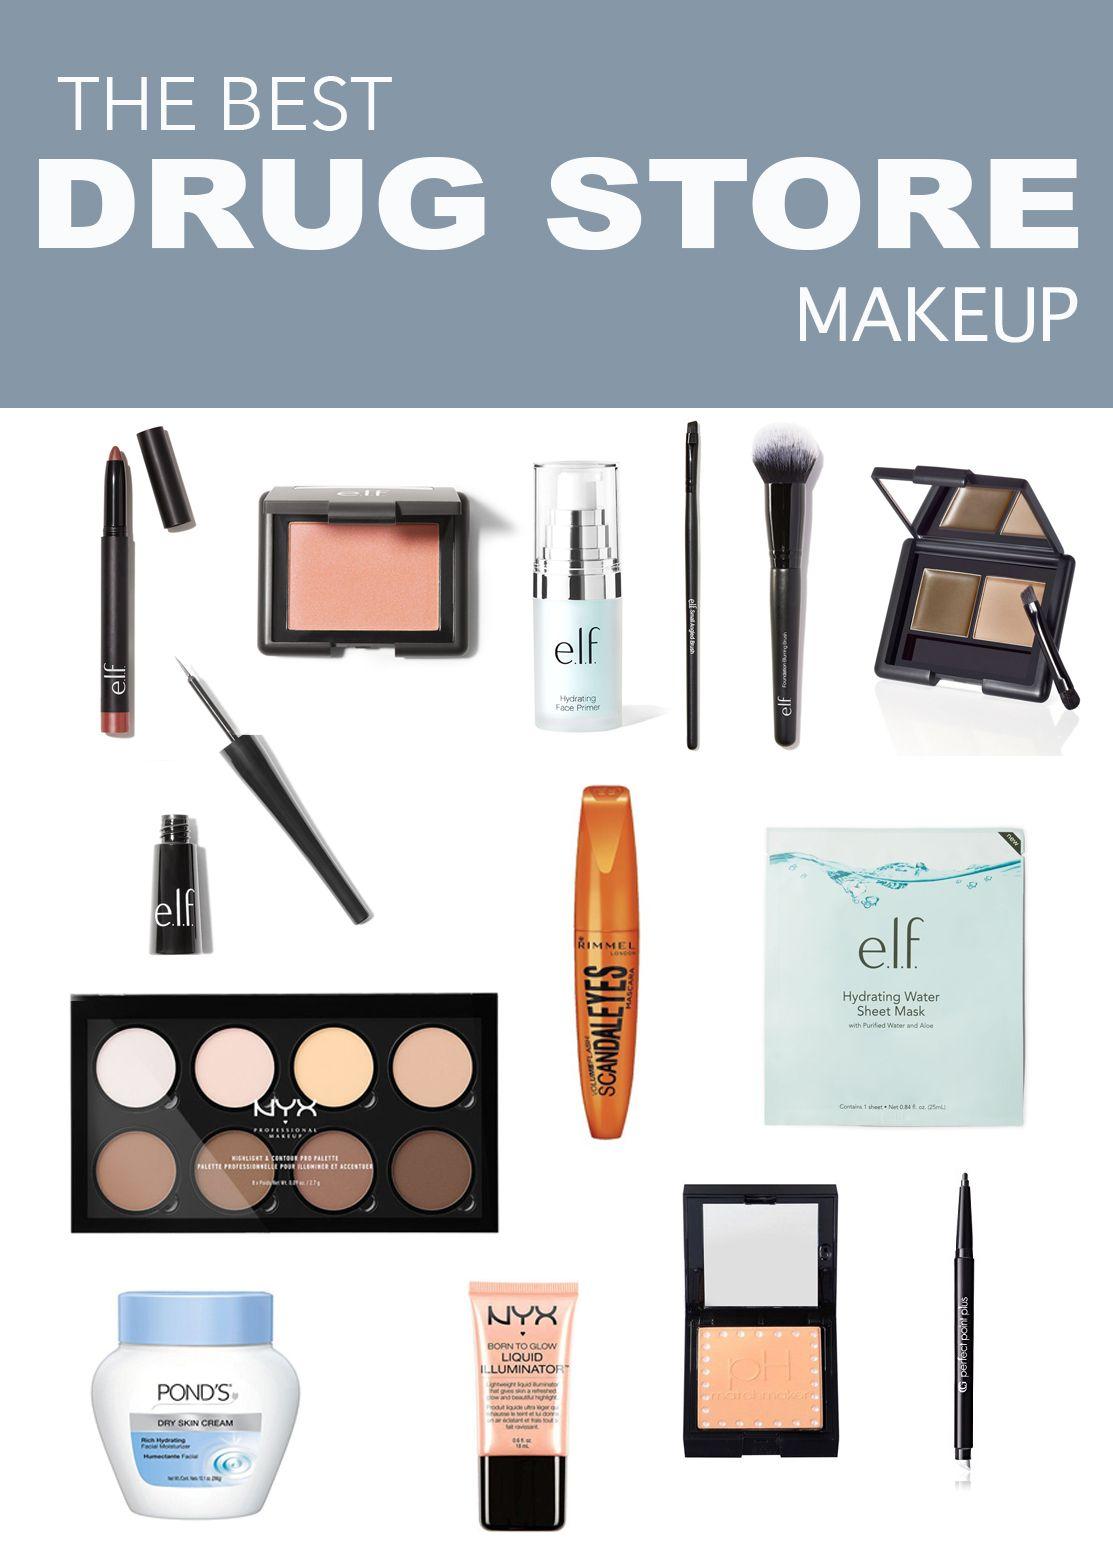 Drug Store Makeup I Swear by Drugstore makeup, Walgreens